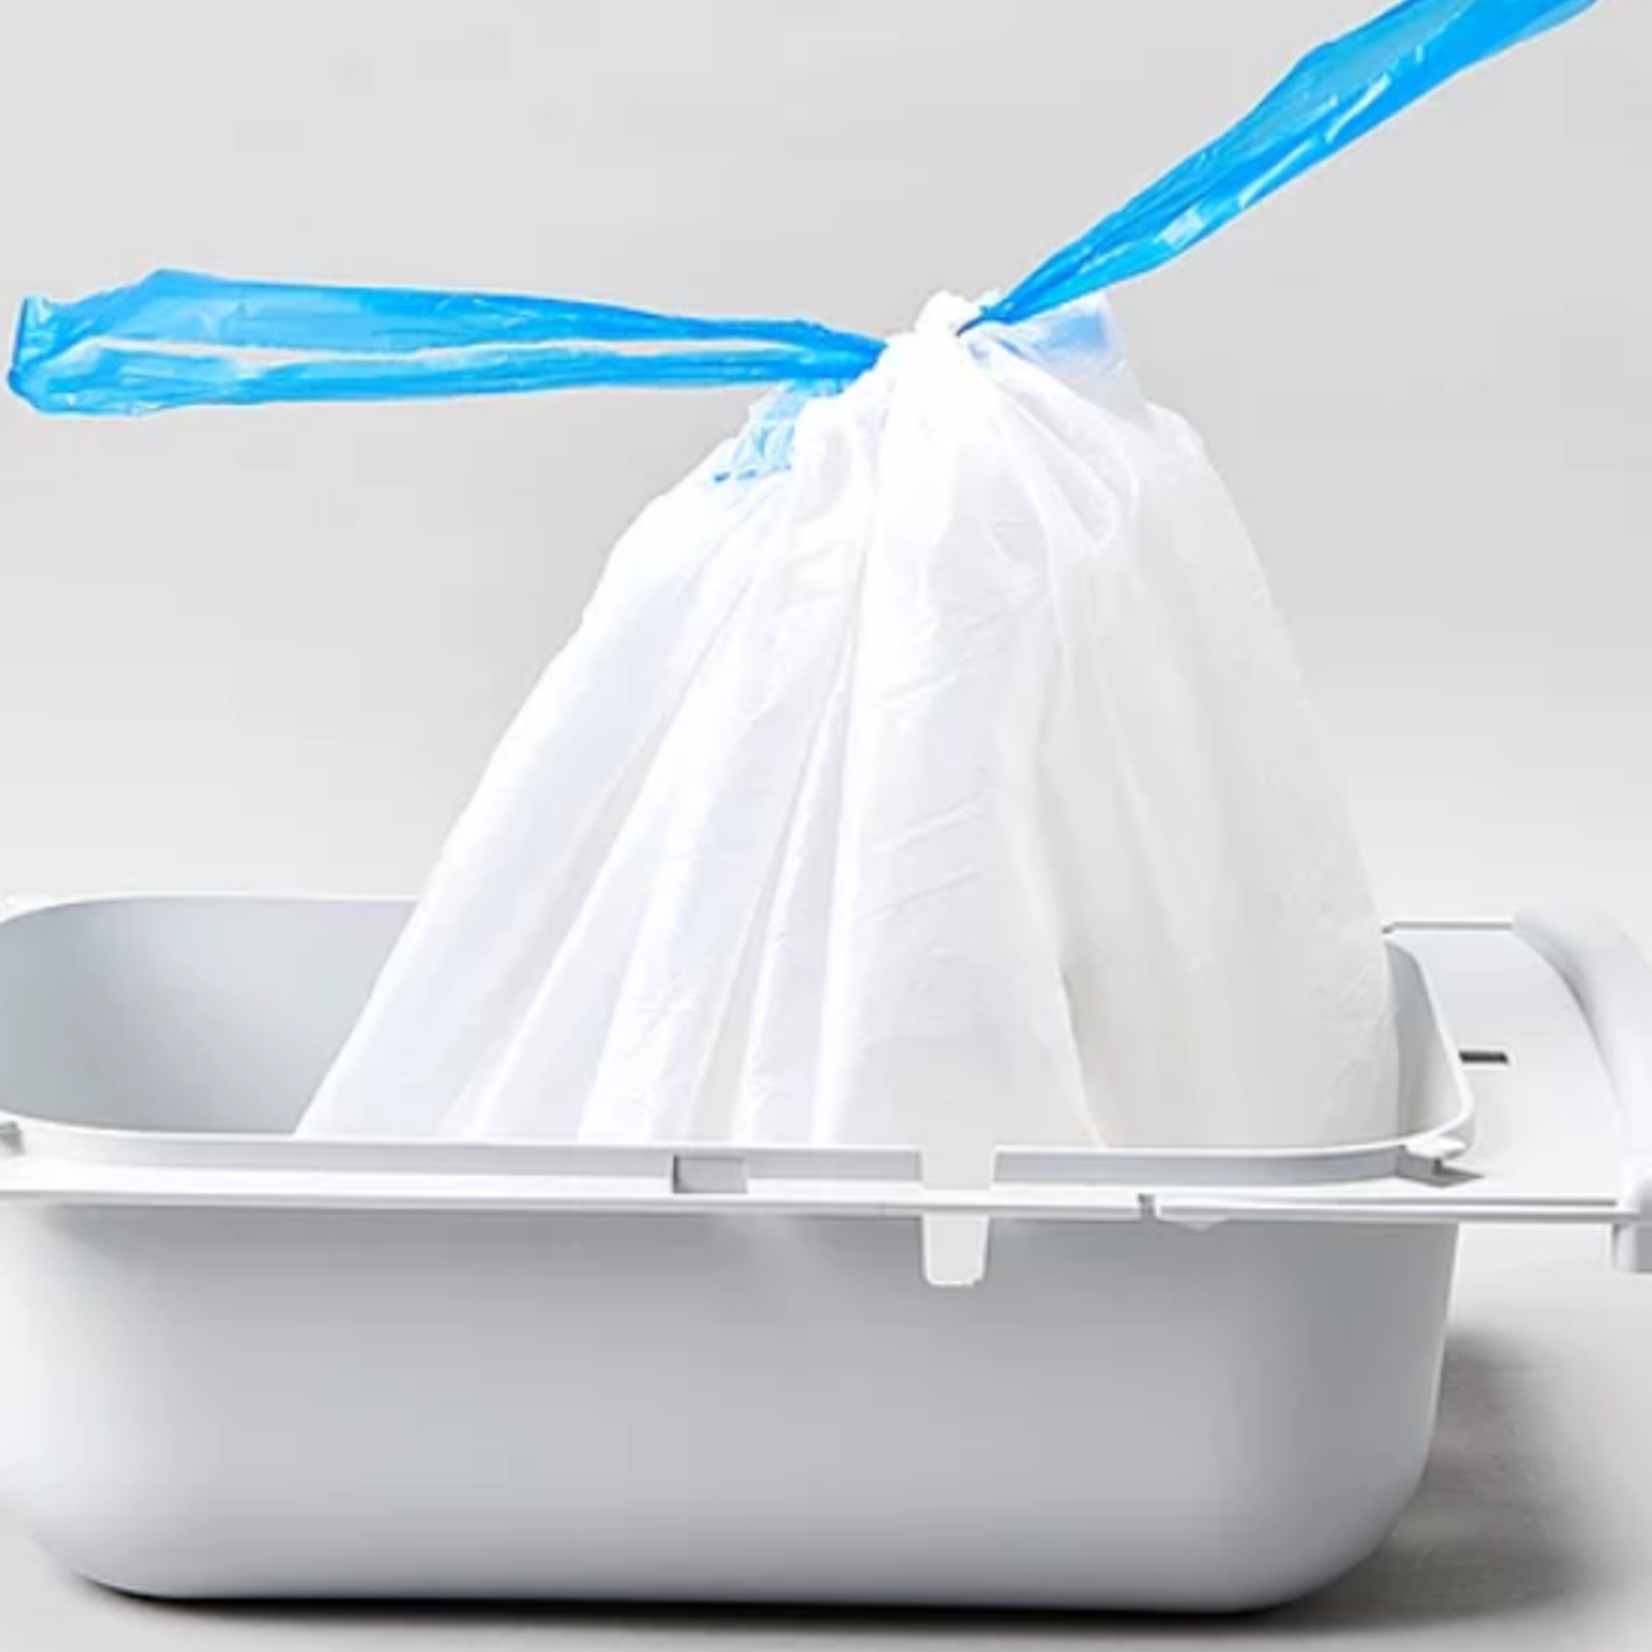 Petkit Pura X Waste Bag refills